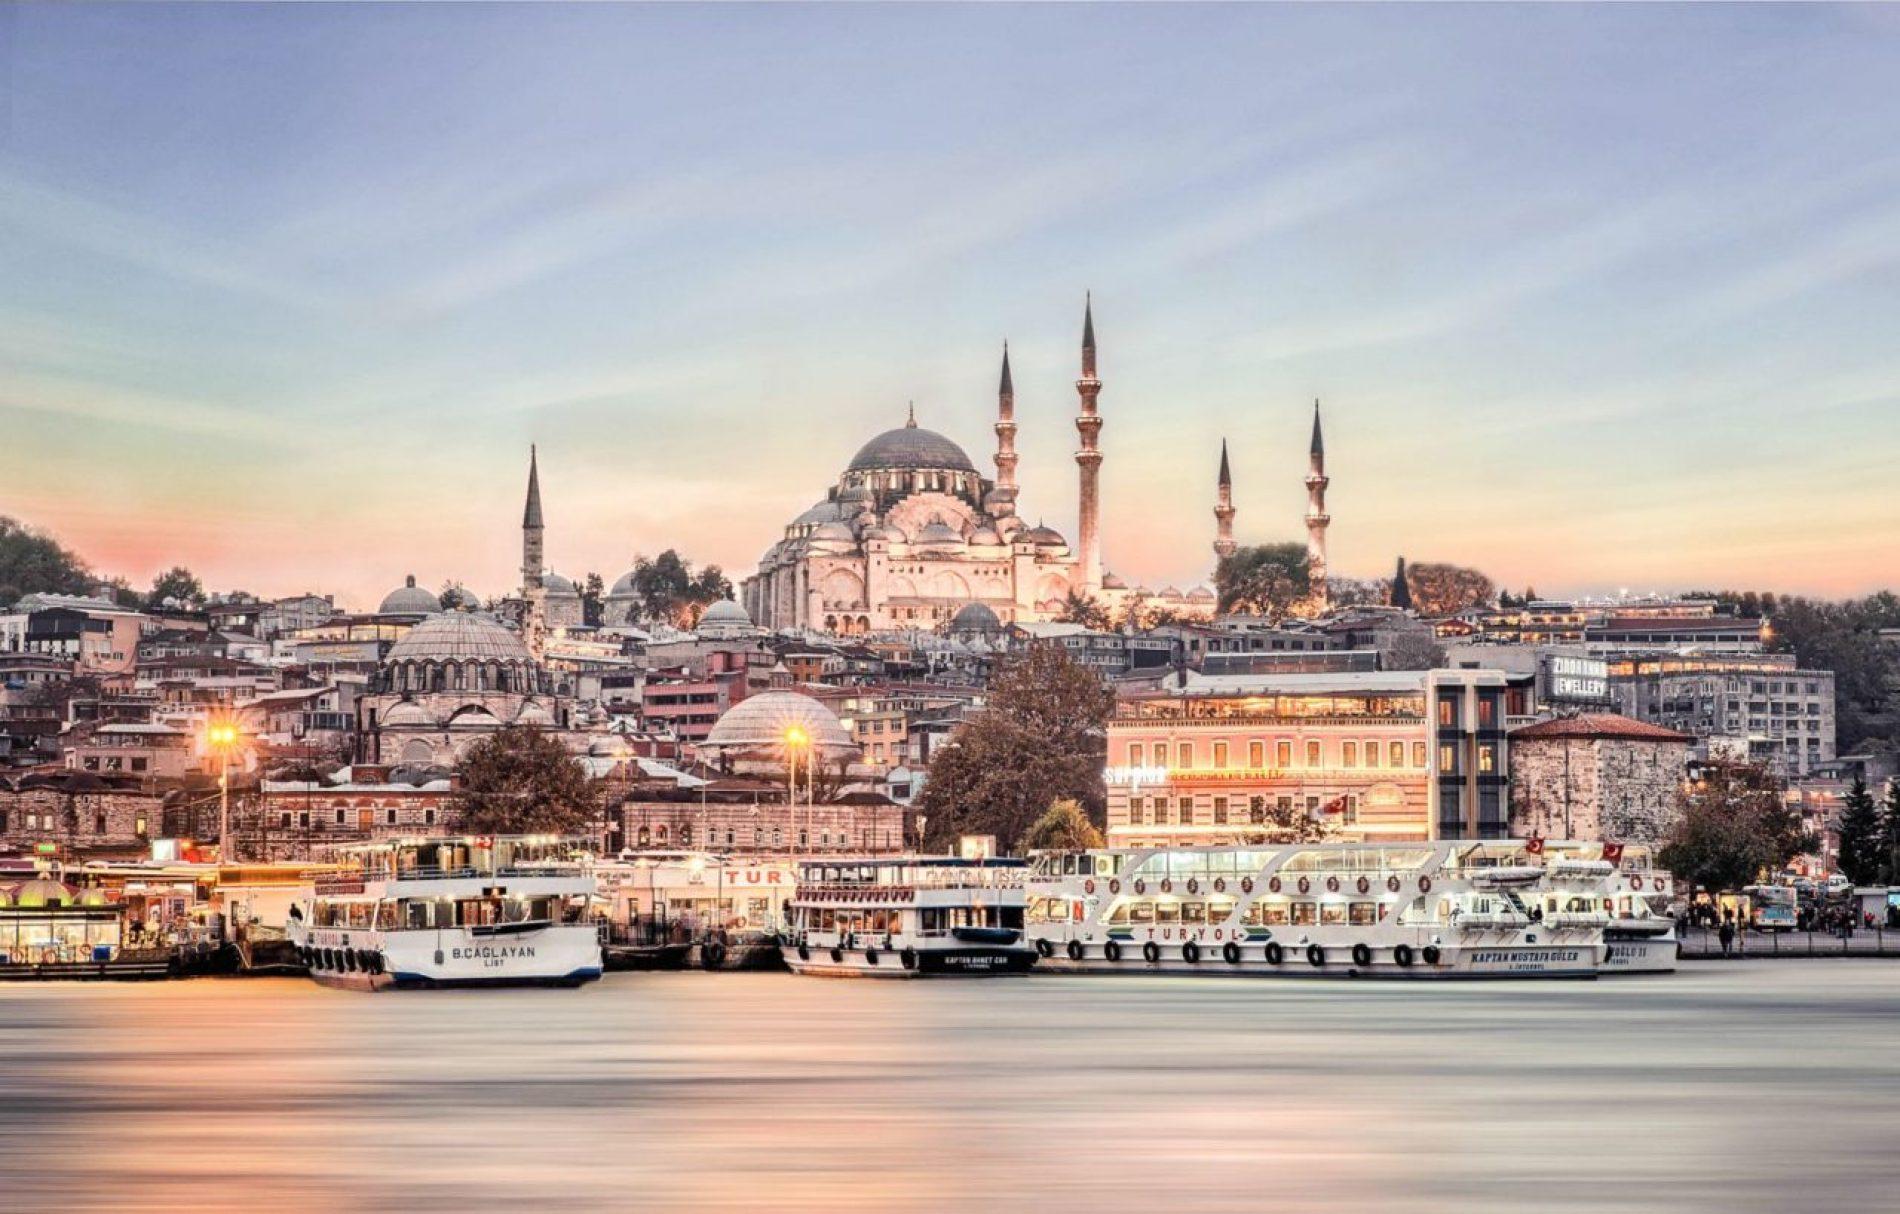 Vanjskotrgovinska komora Bosne i Hercegovine danas otvara predstavništvo u Istanbulu